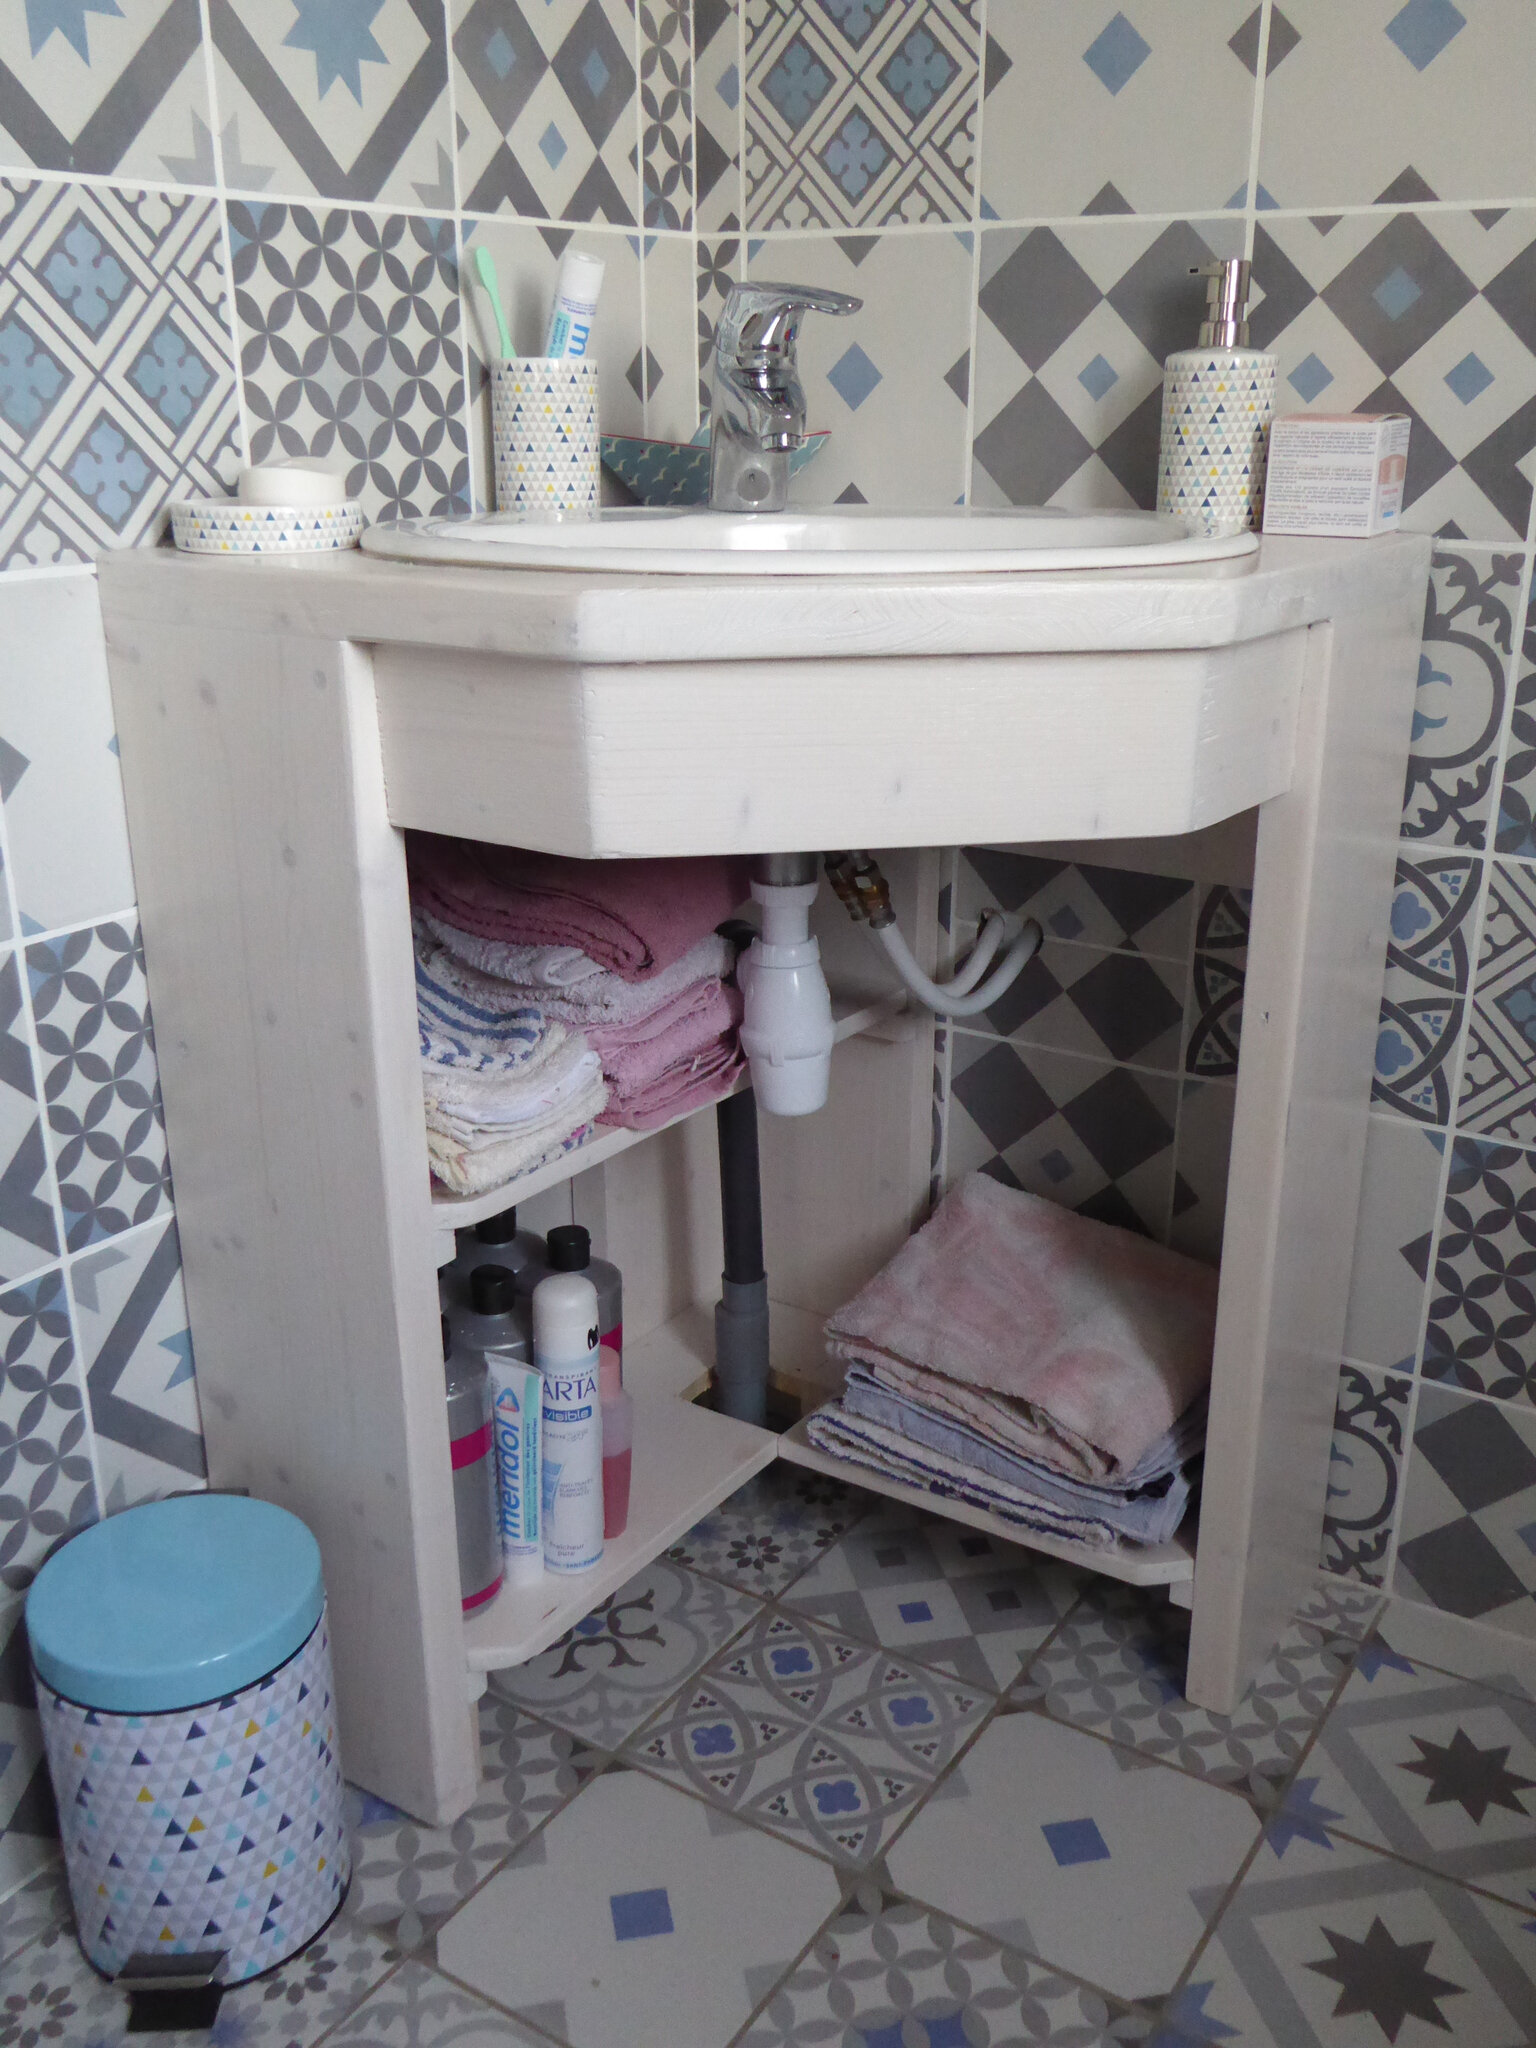 ma salle de bain le blog de l 39 arlesienne. Black Bedroom Furniture Sets. Home Design Ideas